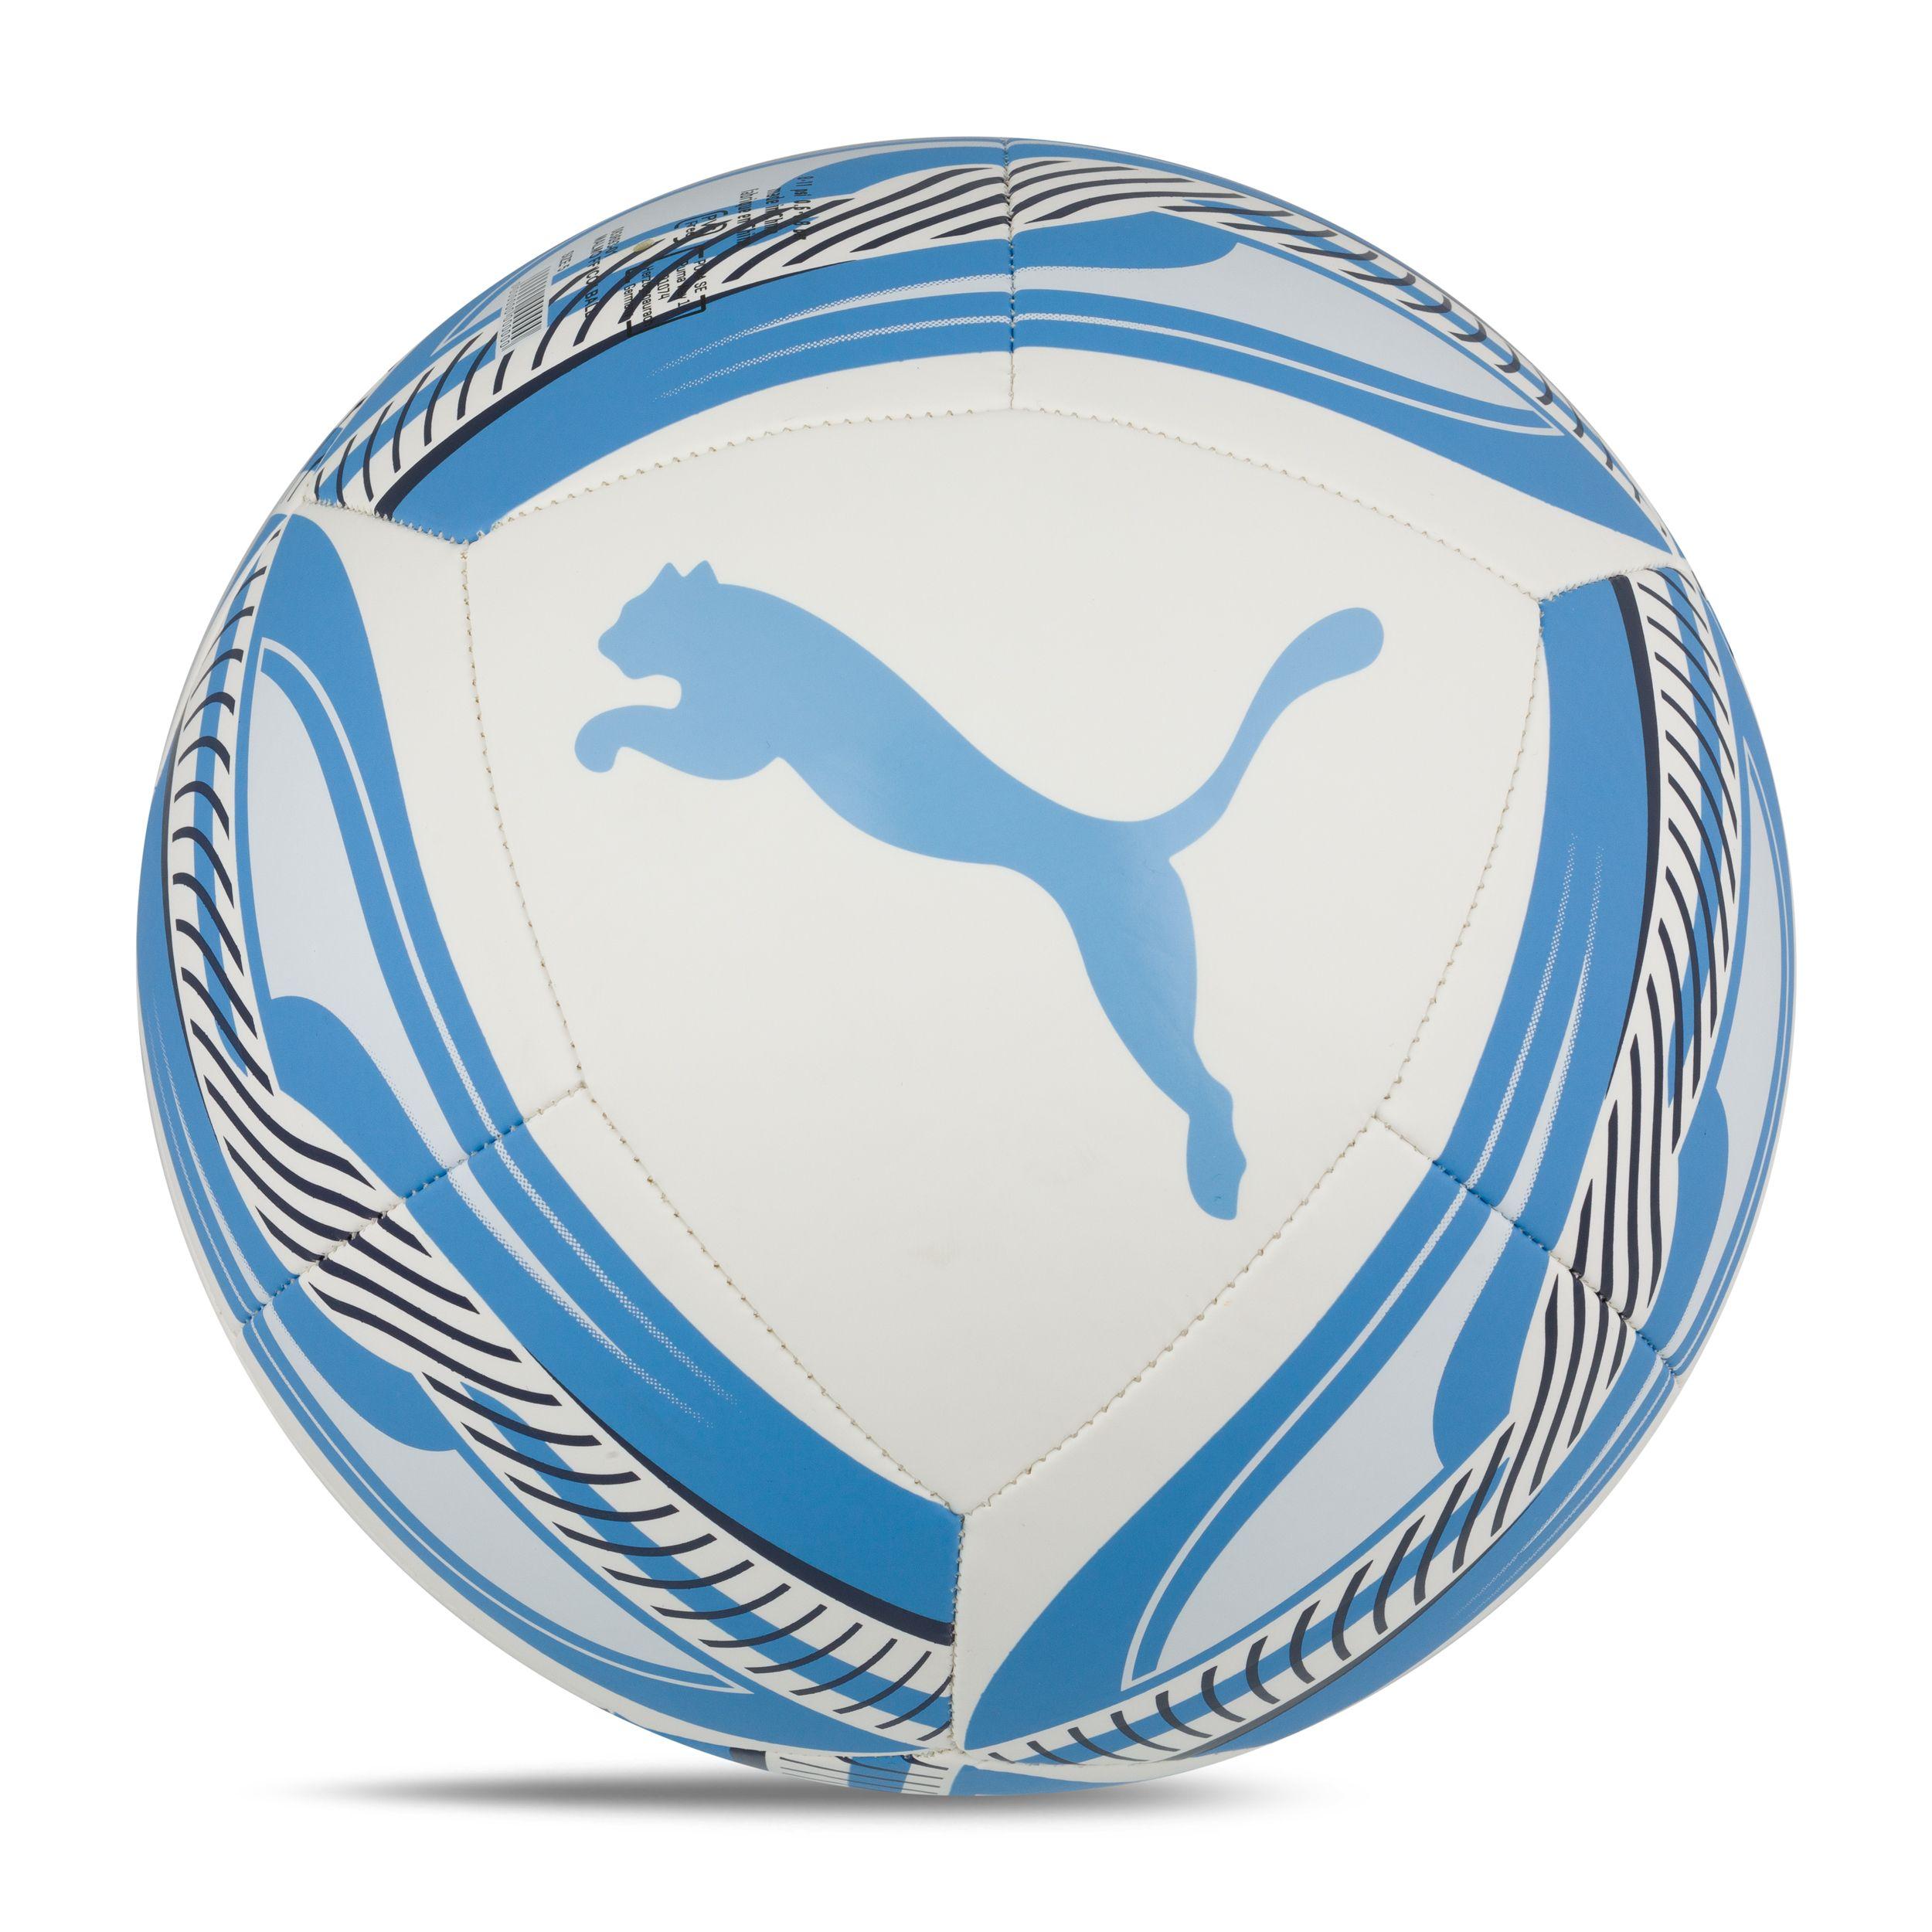 Puma fotboll